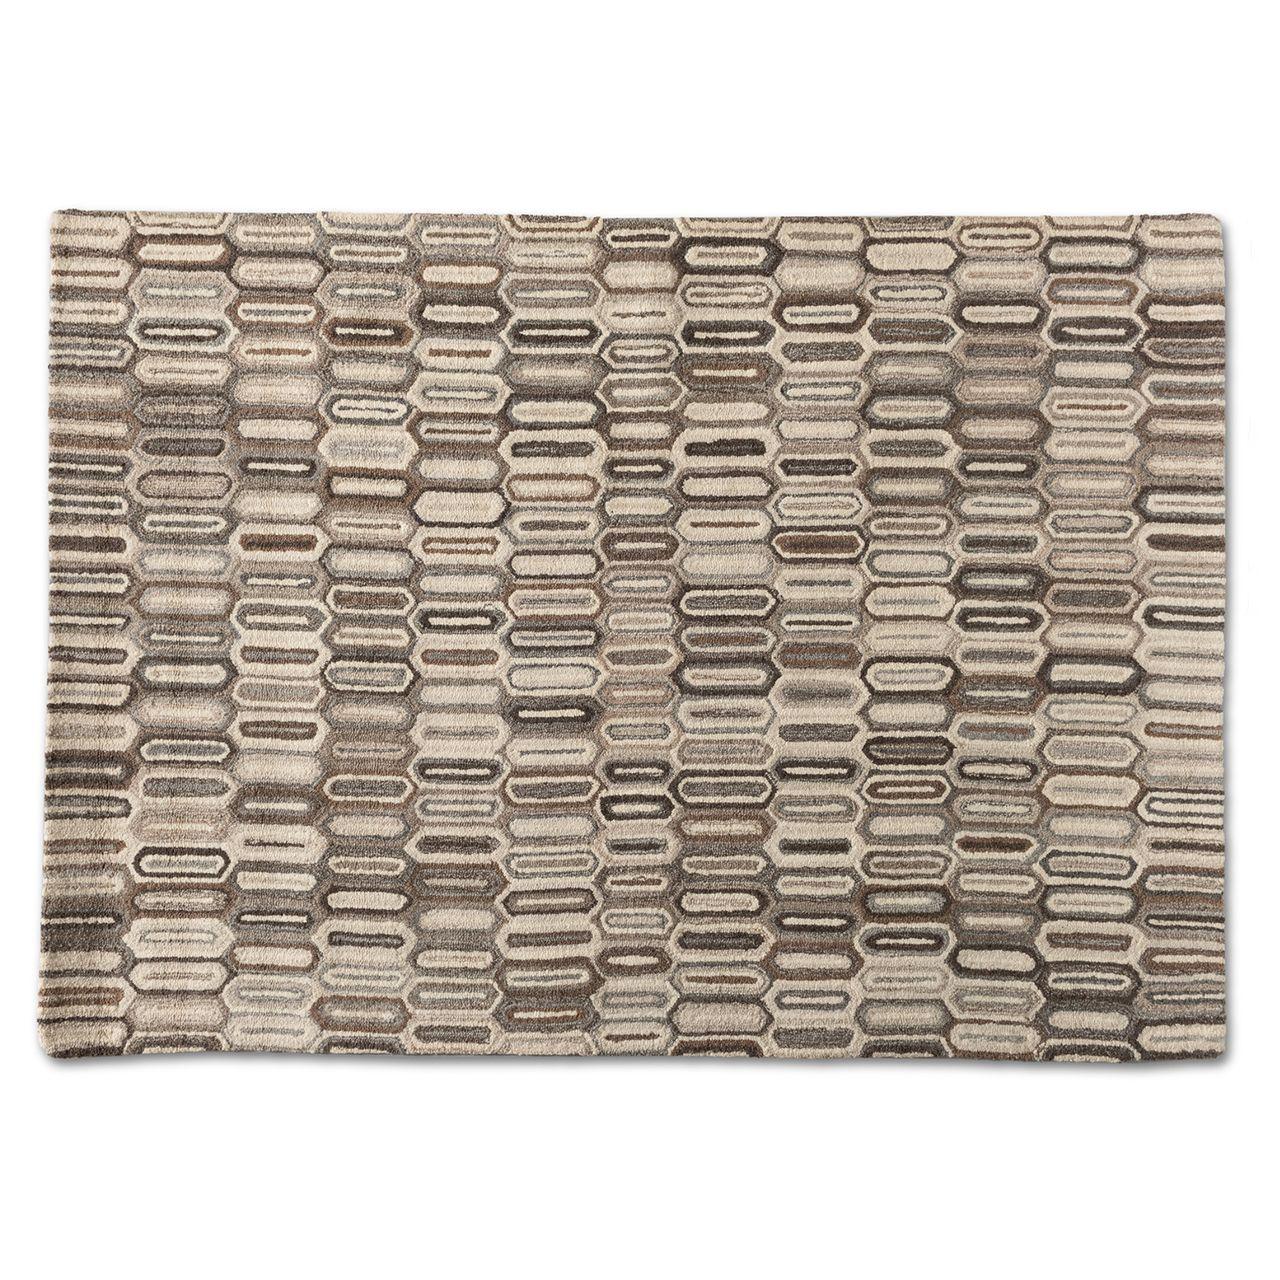 Baxton Studio Kavir Natural Brown Hand-Tufted Wool Area Rug